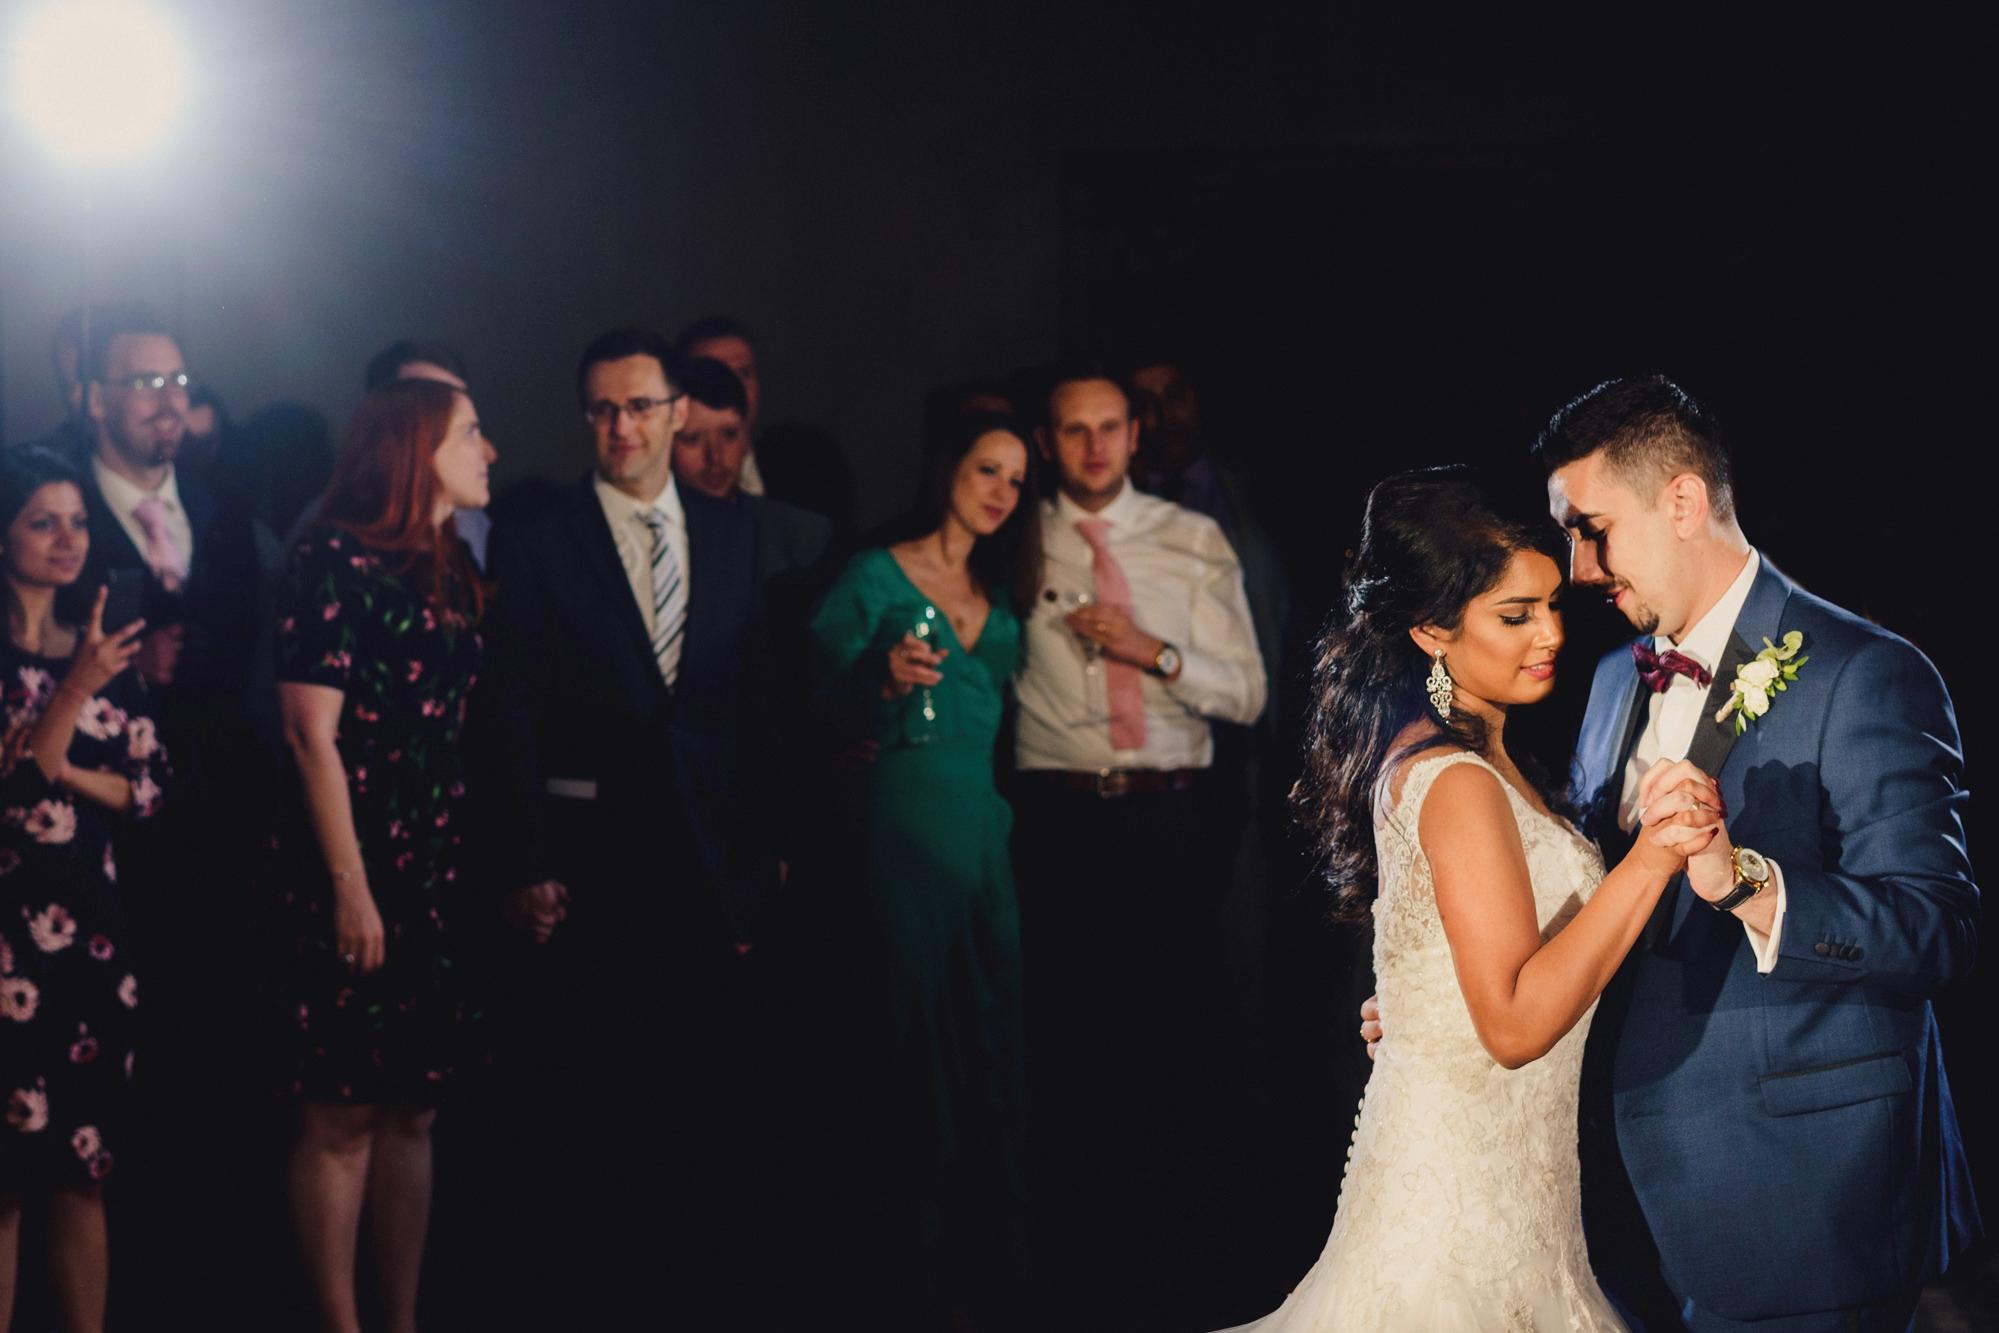 Hilton Hotel Wedding Photography